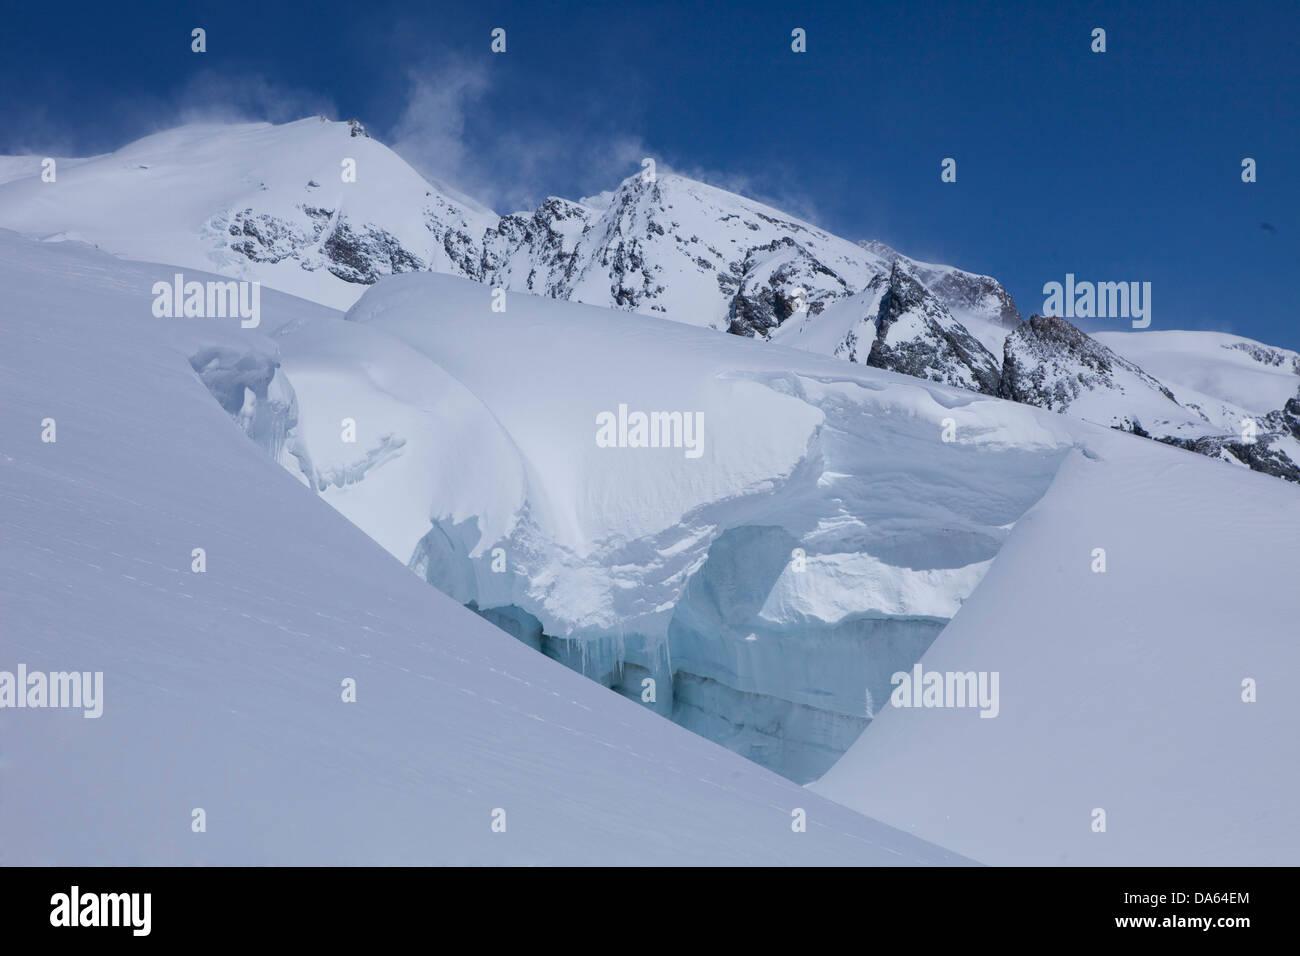 Mountain, mountains, glaciers, ice, moraine, canton, Valais, Aletsch, glacier, winter, scenery, landscape, Switzerland, - Stock Image